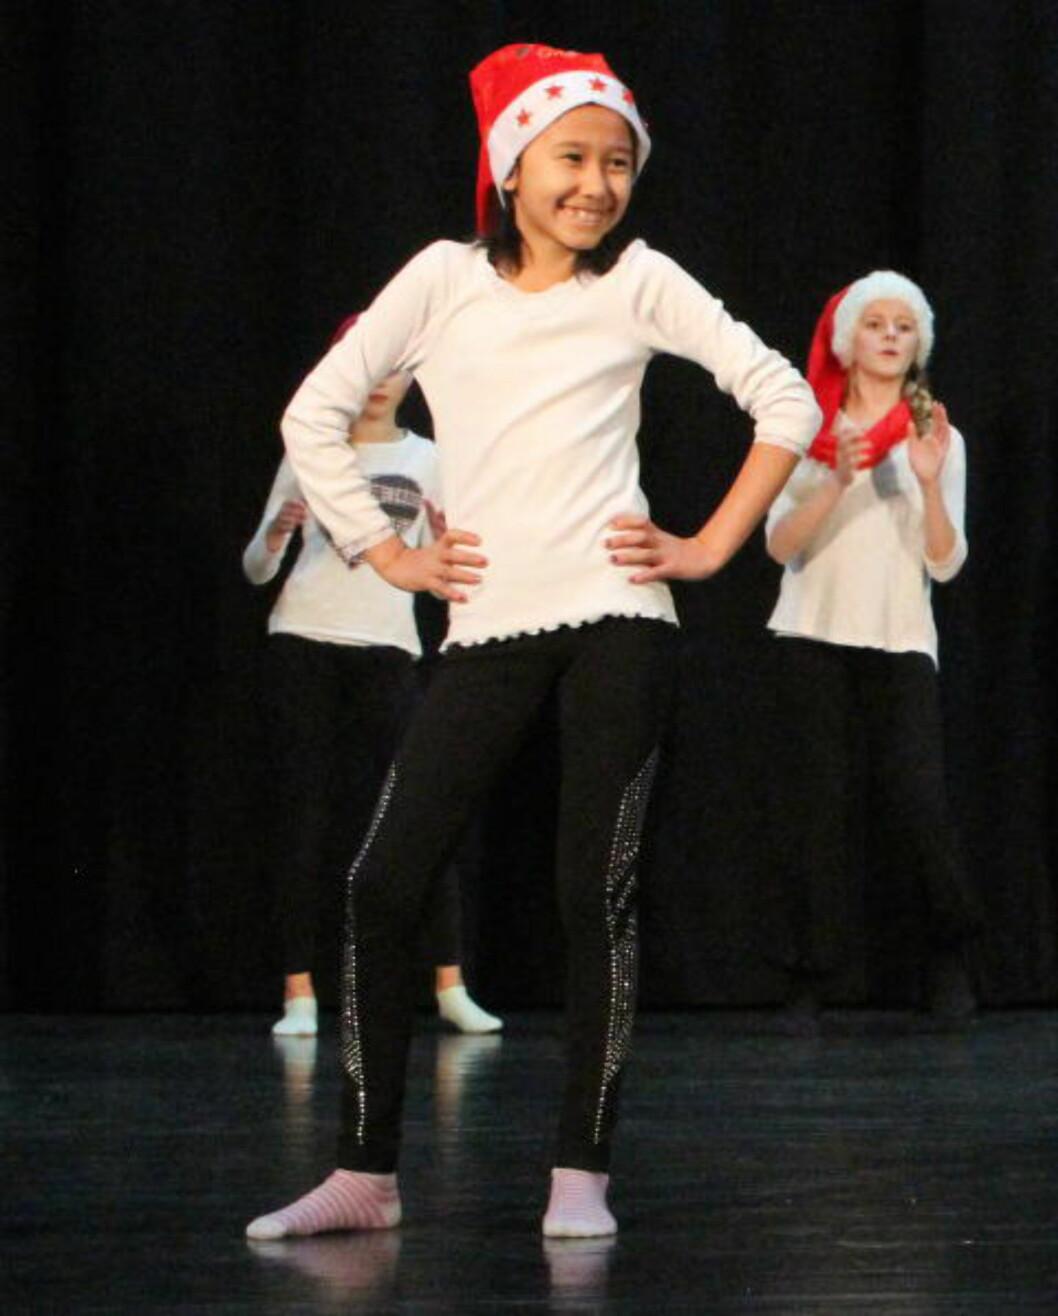 <strong>JULEAVSLUTNING:</strong> Farida deltar på avslutning for kulturskolens danseelever i jula 2014. På bildet danser også Silja Jøranli (t.h). Foto: Stine Jøranli